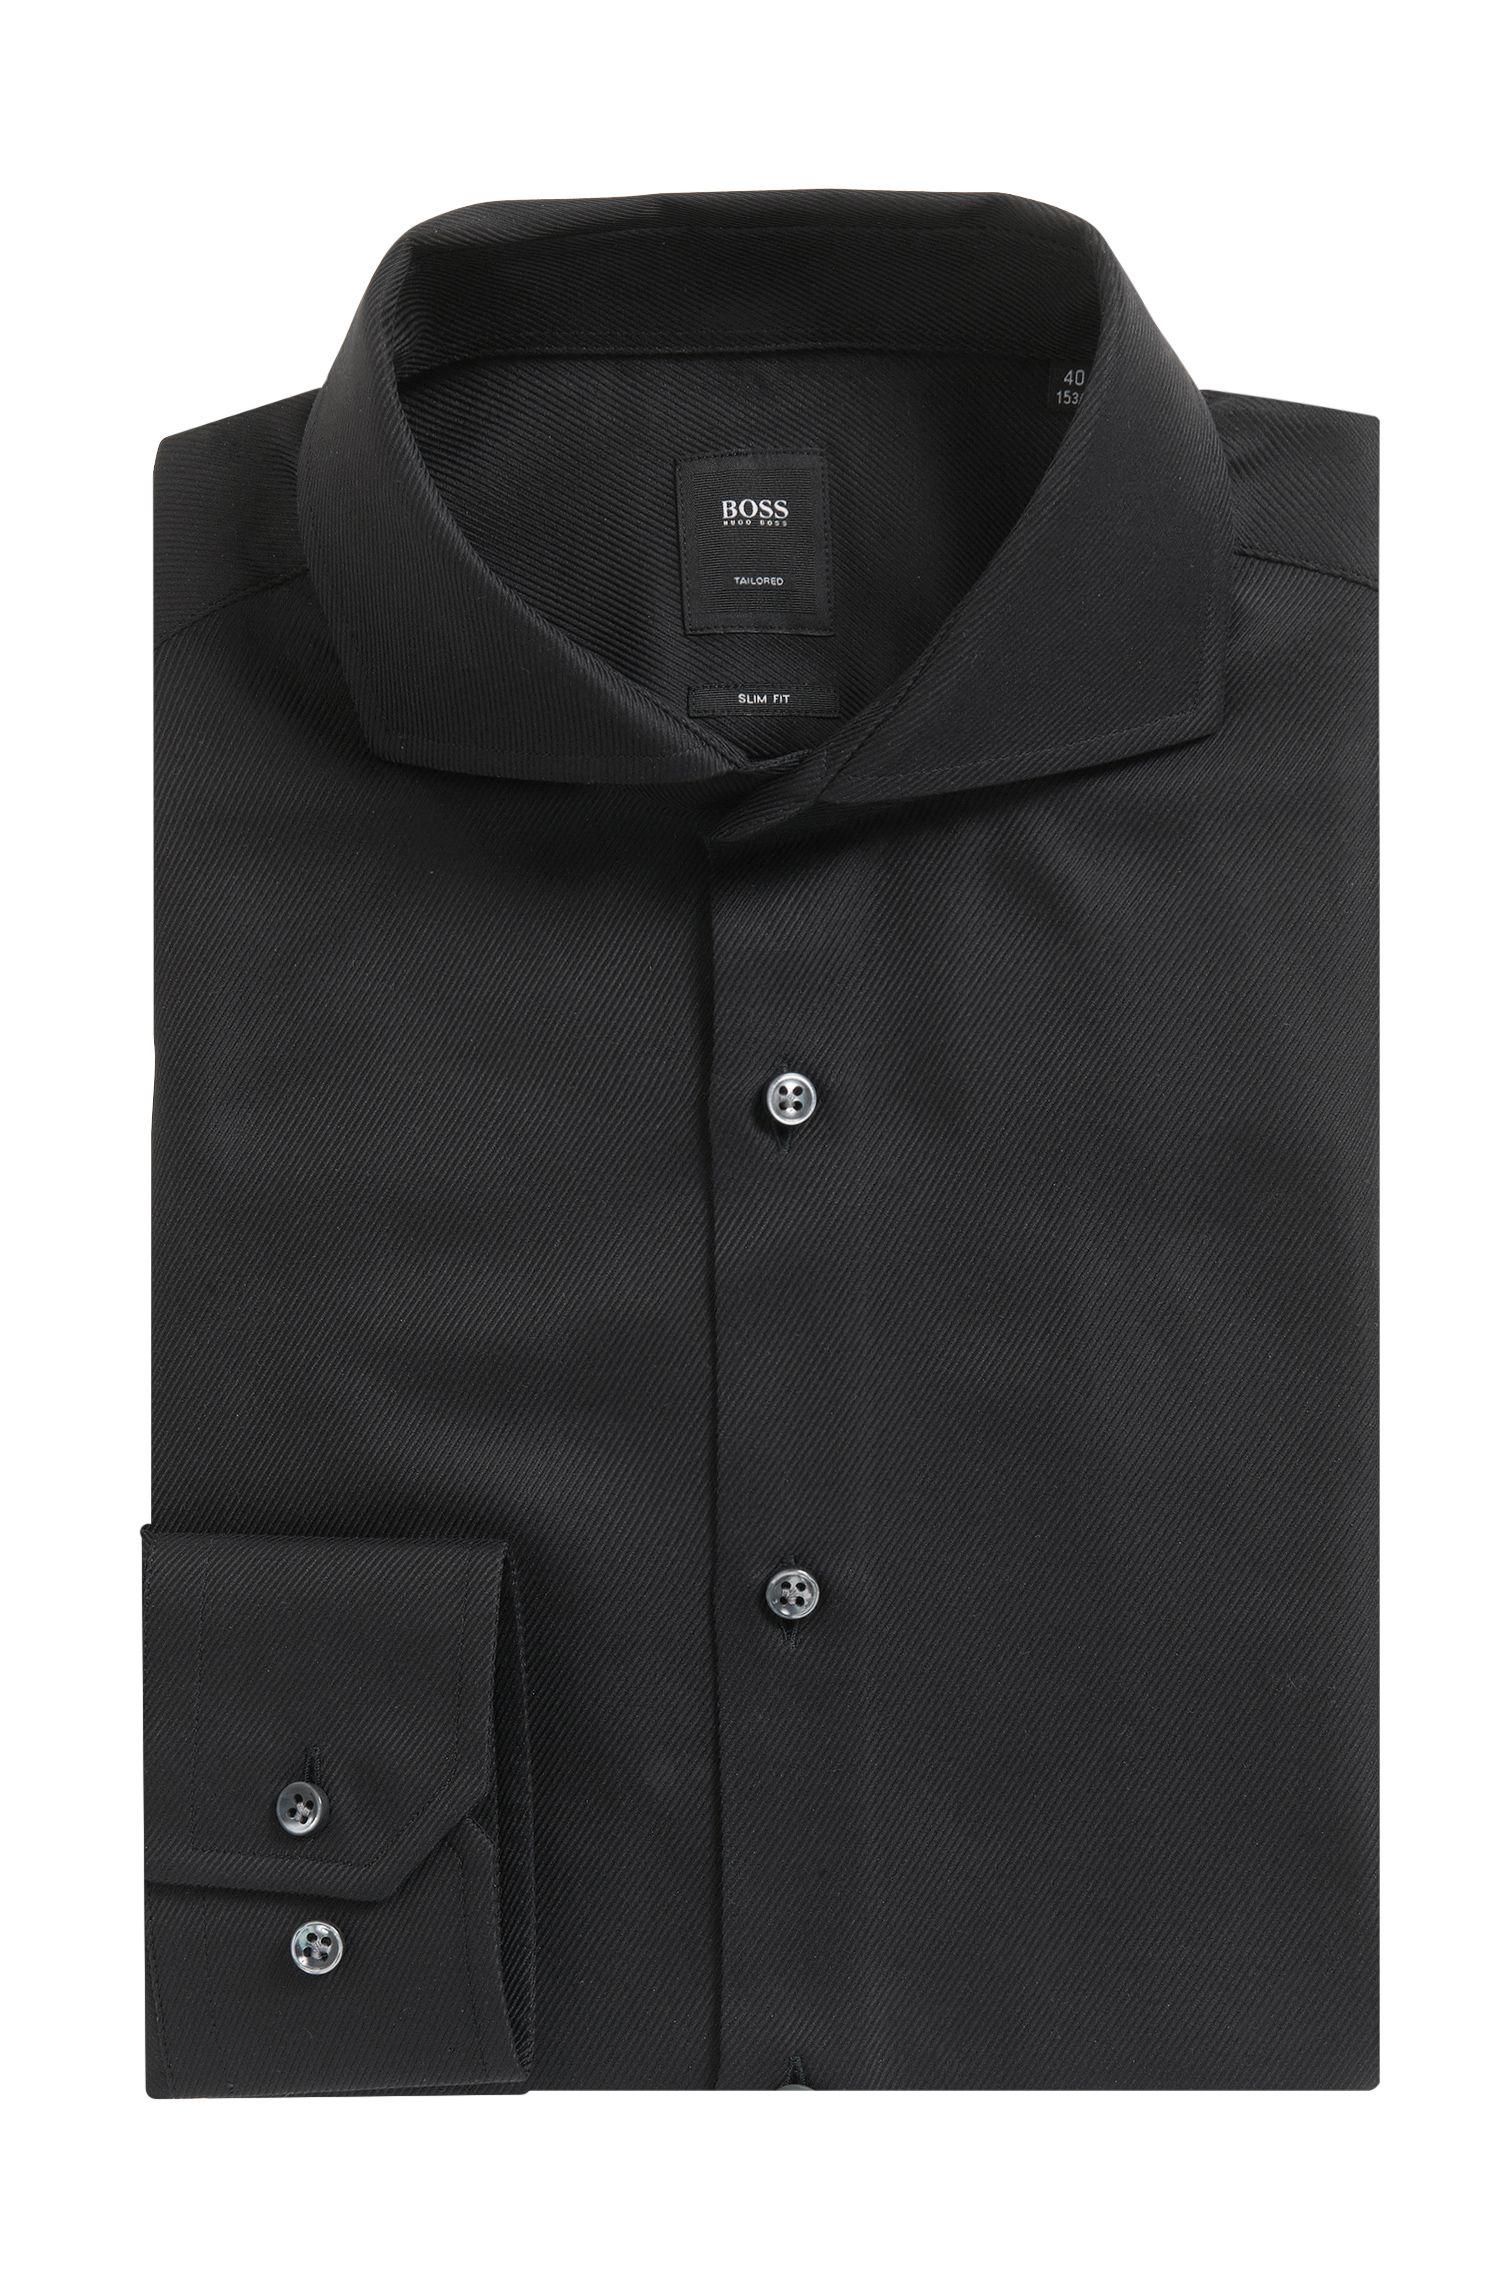 Cotton Twill Dress Shirt, Slim Fit | T-Christo, Black